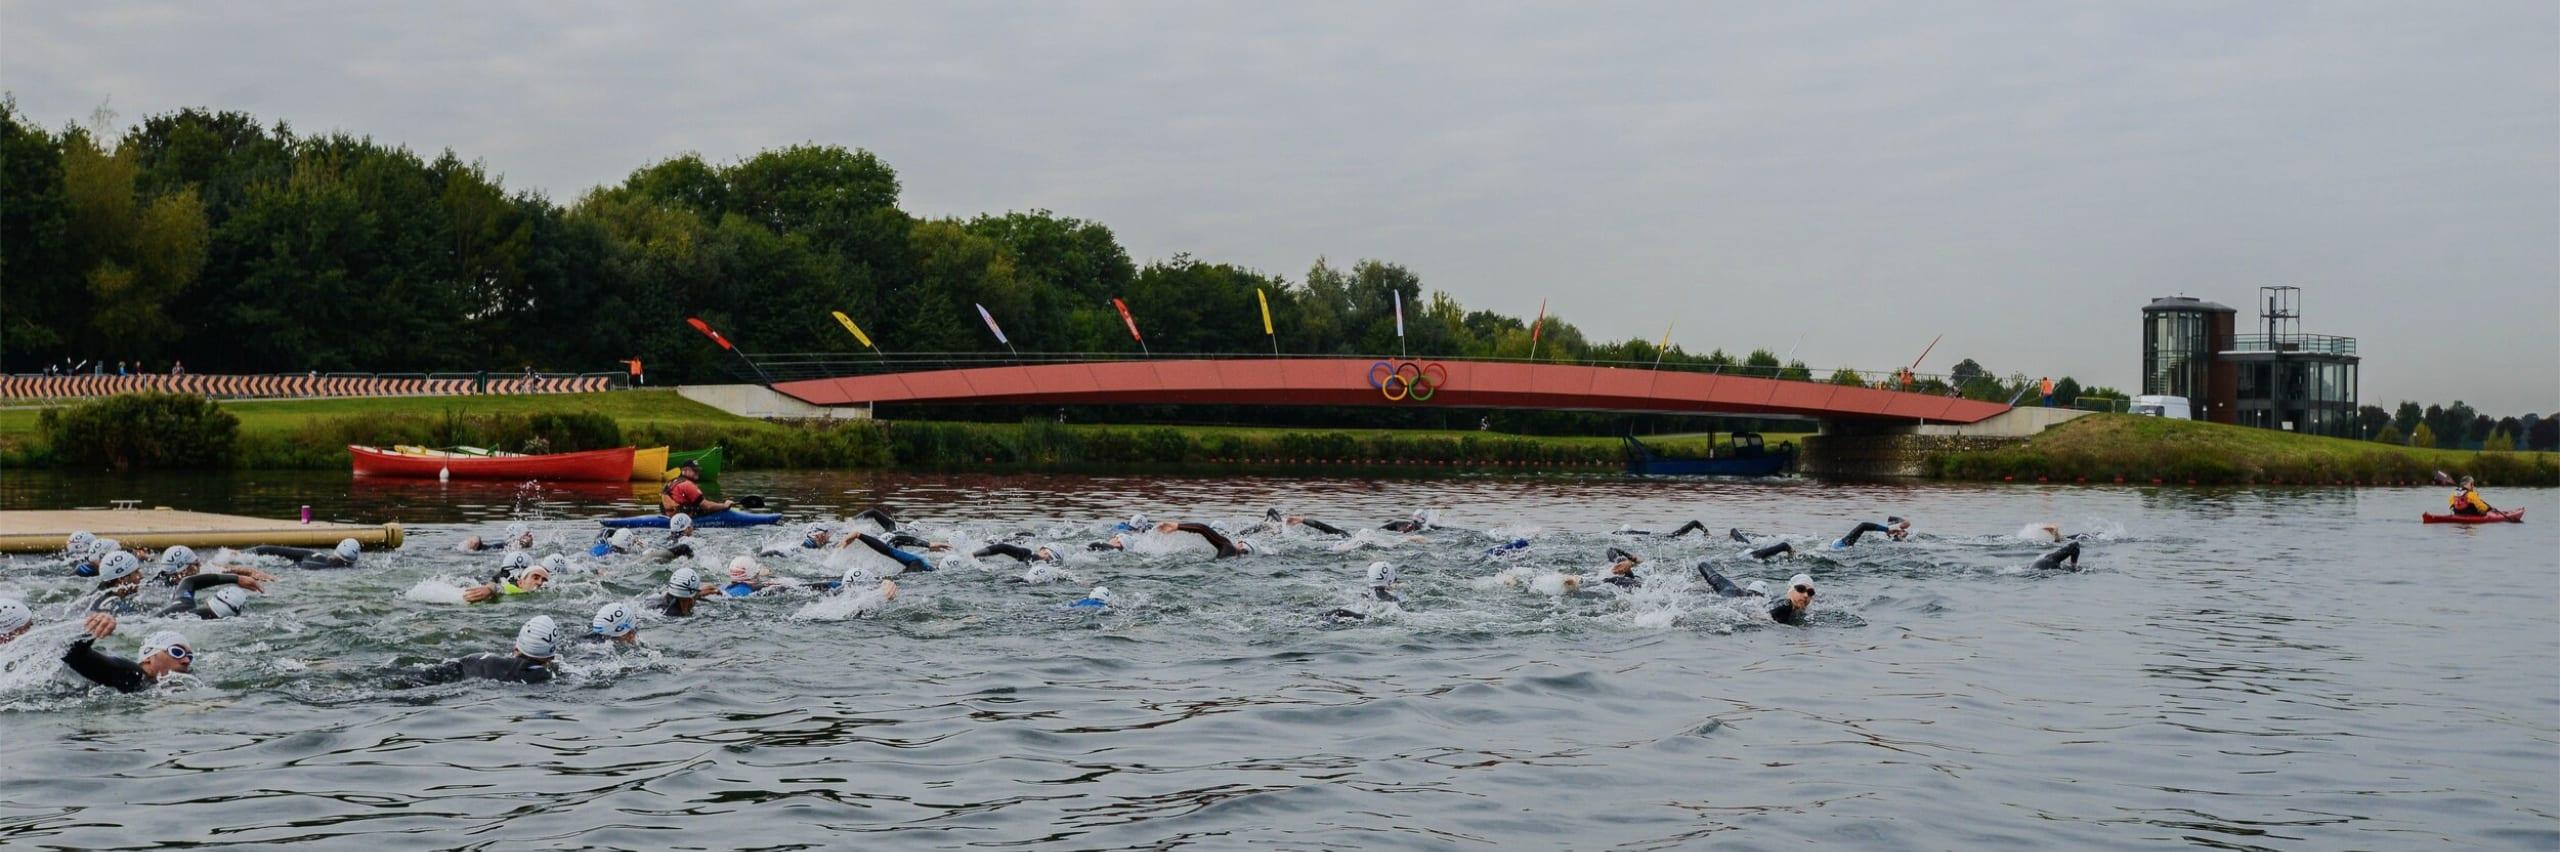 Swim Long Eton Dorney